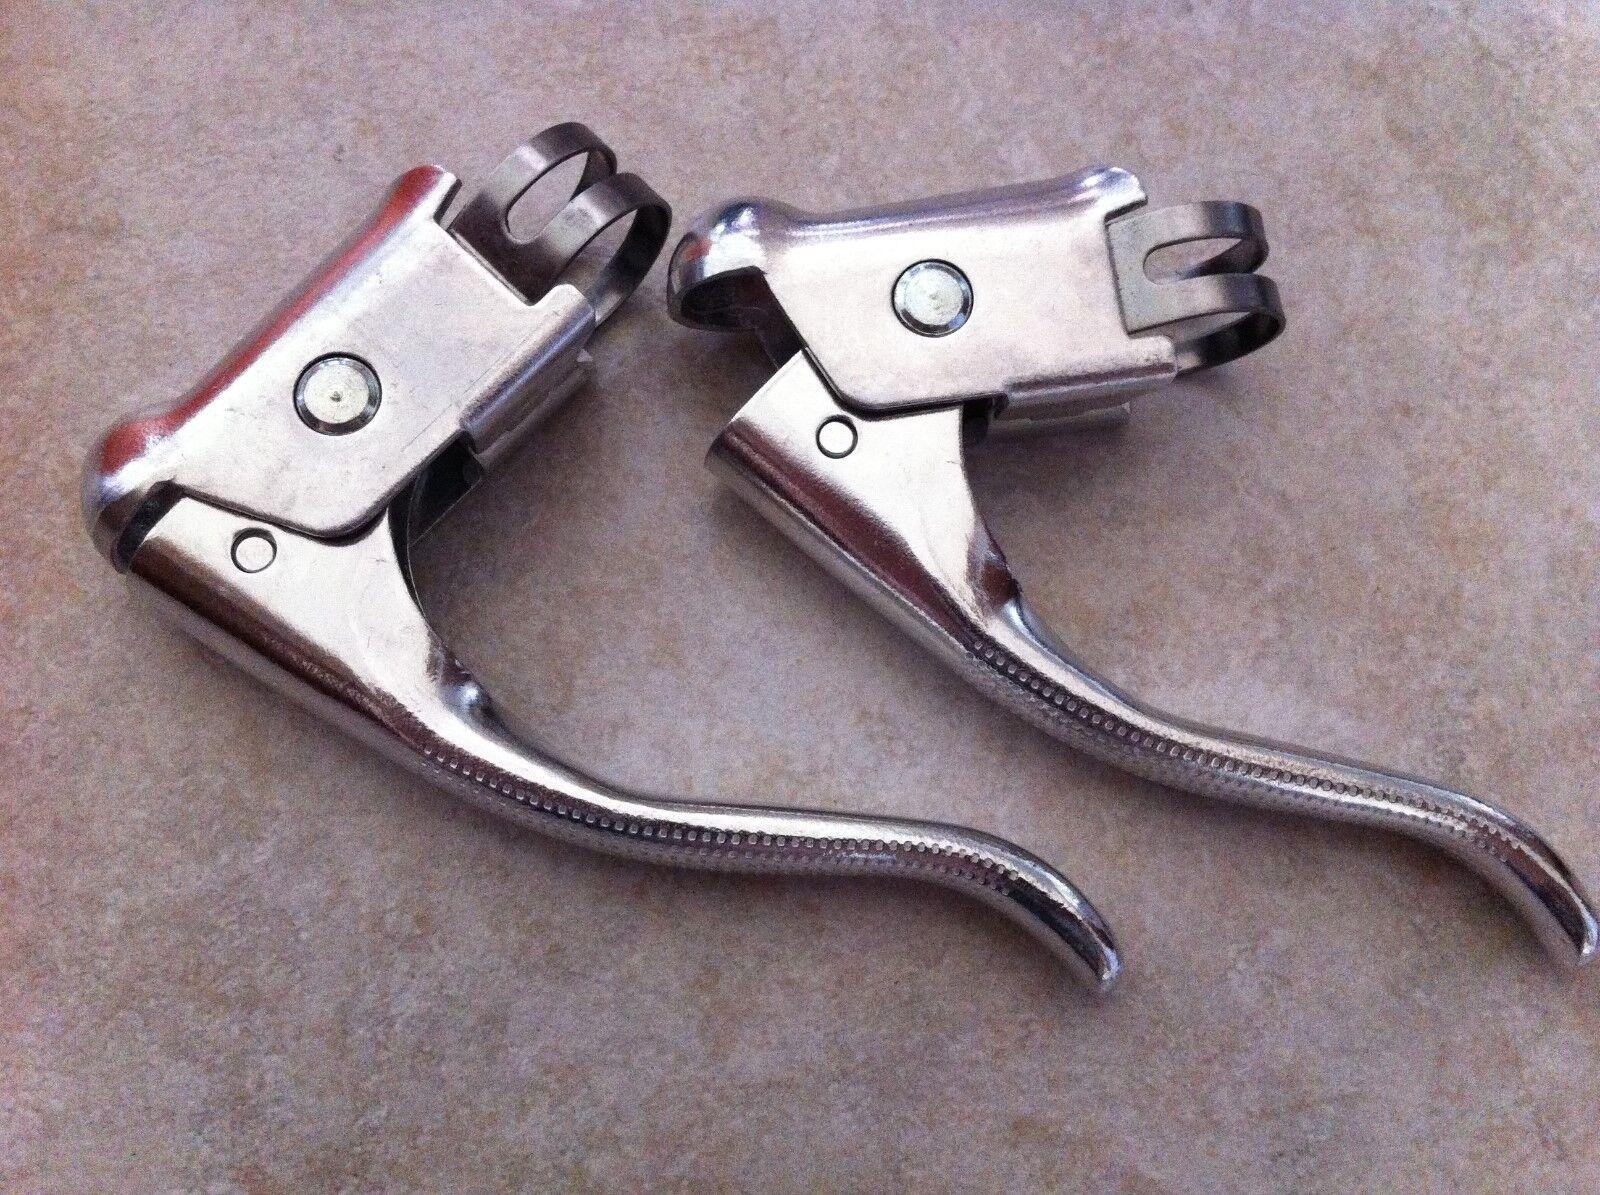 1 Pair Vintage Road Bike Safety Dual Brake Levers Racing Mountain Bicycle Drop